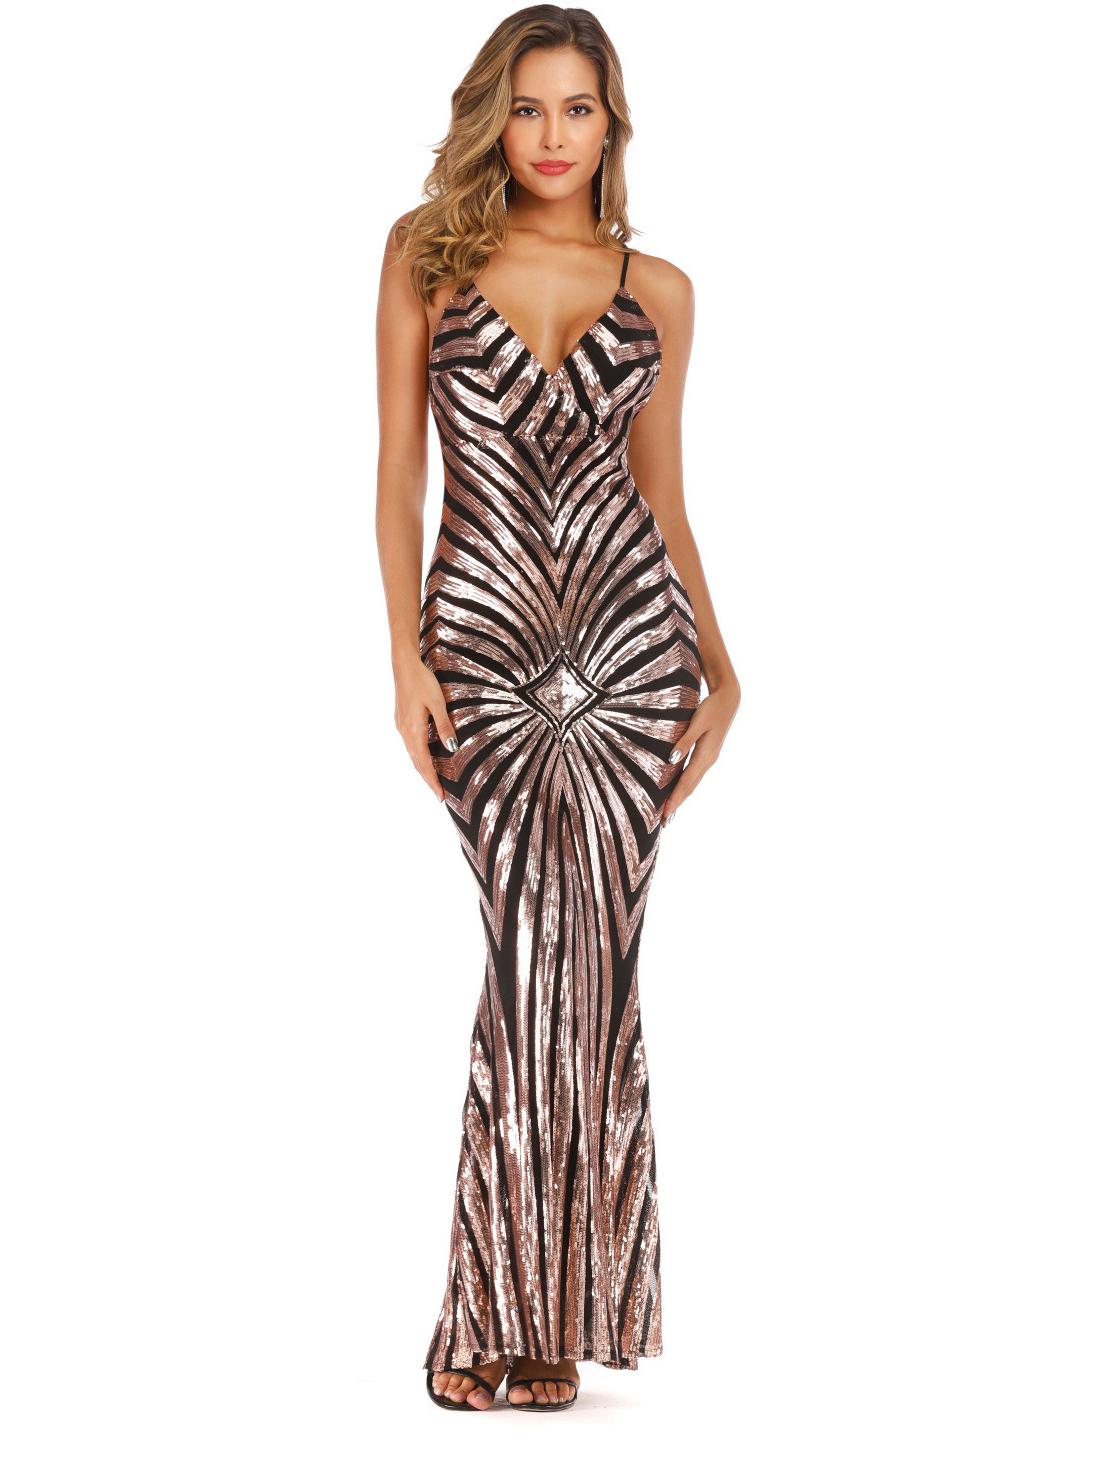 V Neck Backless Sequin Sleeveless Maxi Dress